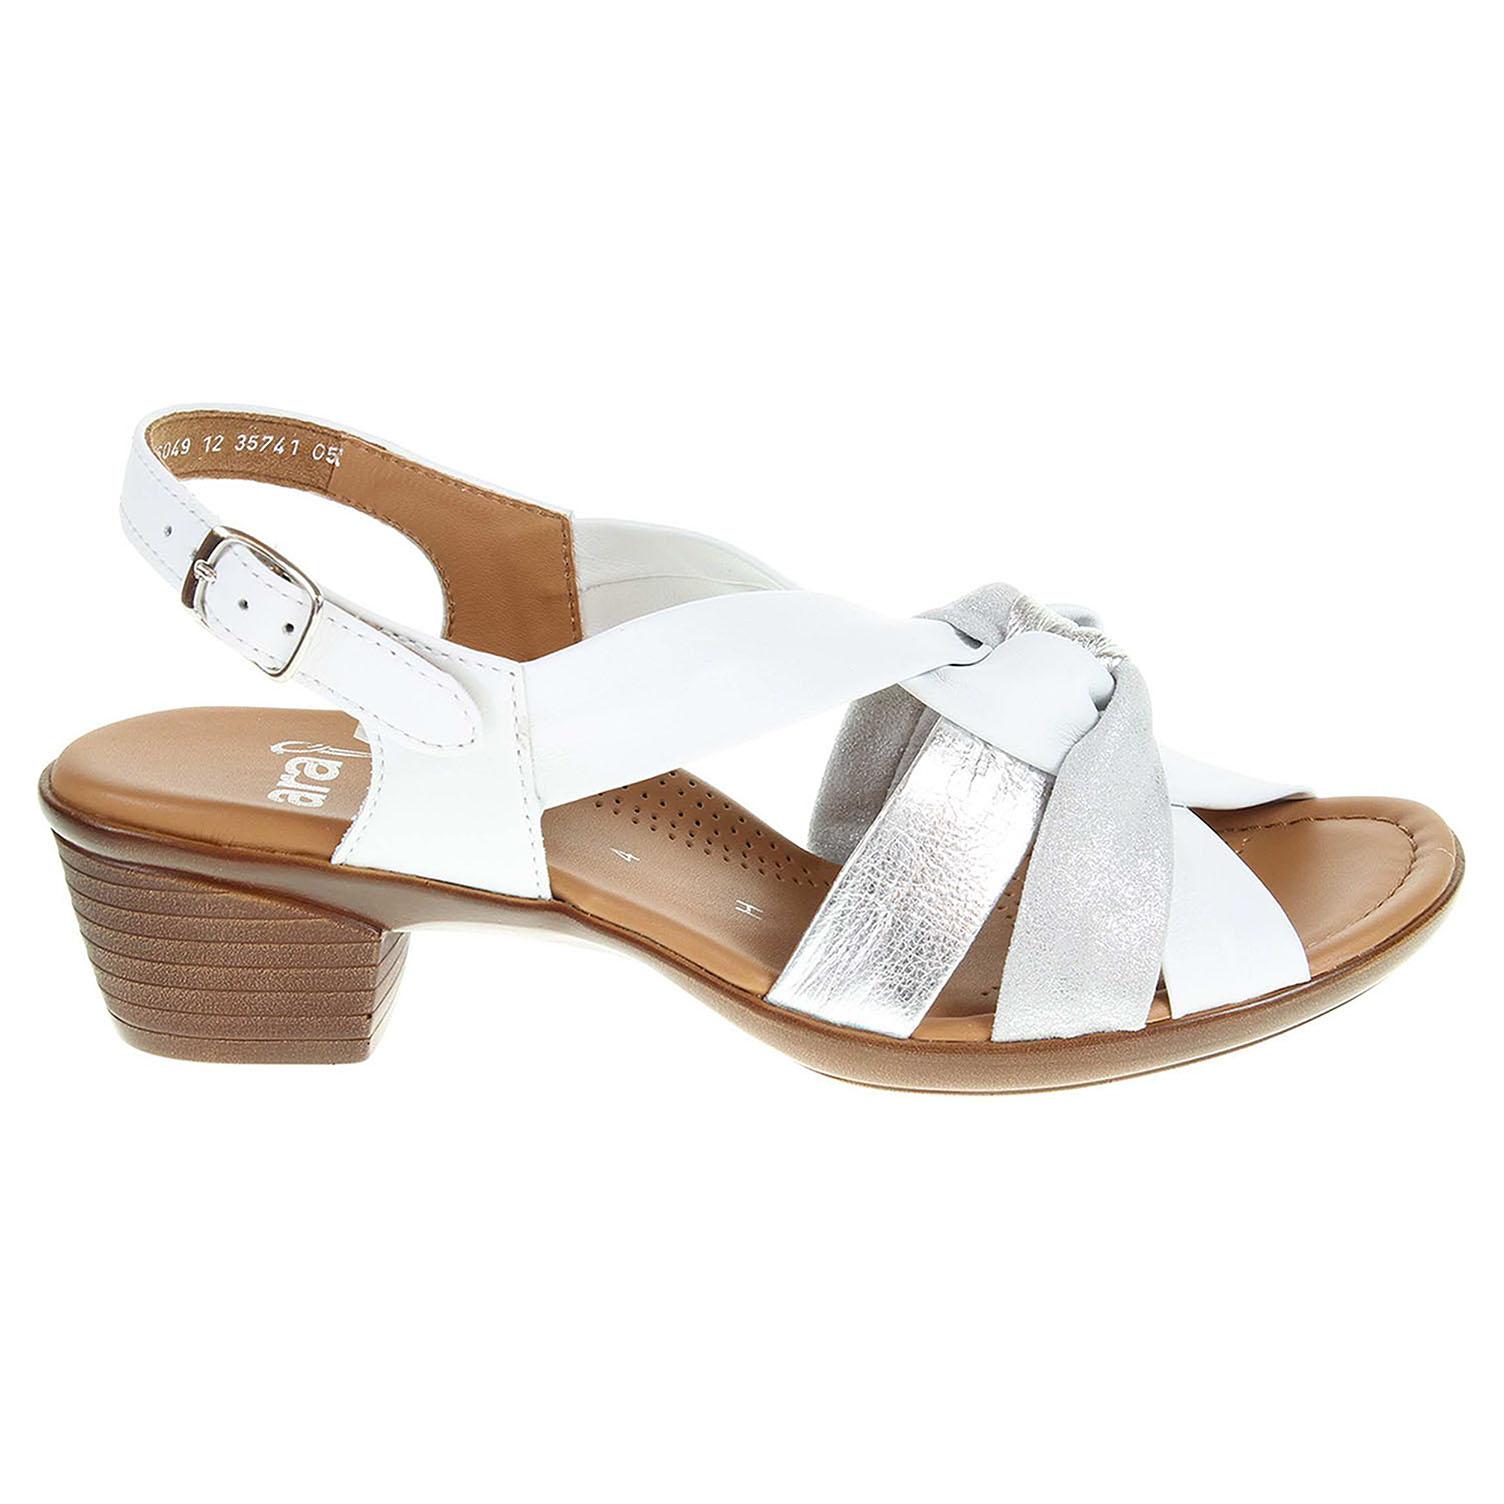 Ecco Ara dámské sandály 12-35741-05 weiss-silber 23801144